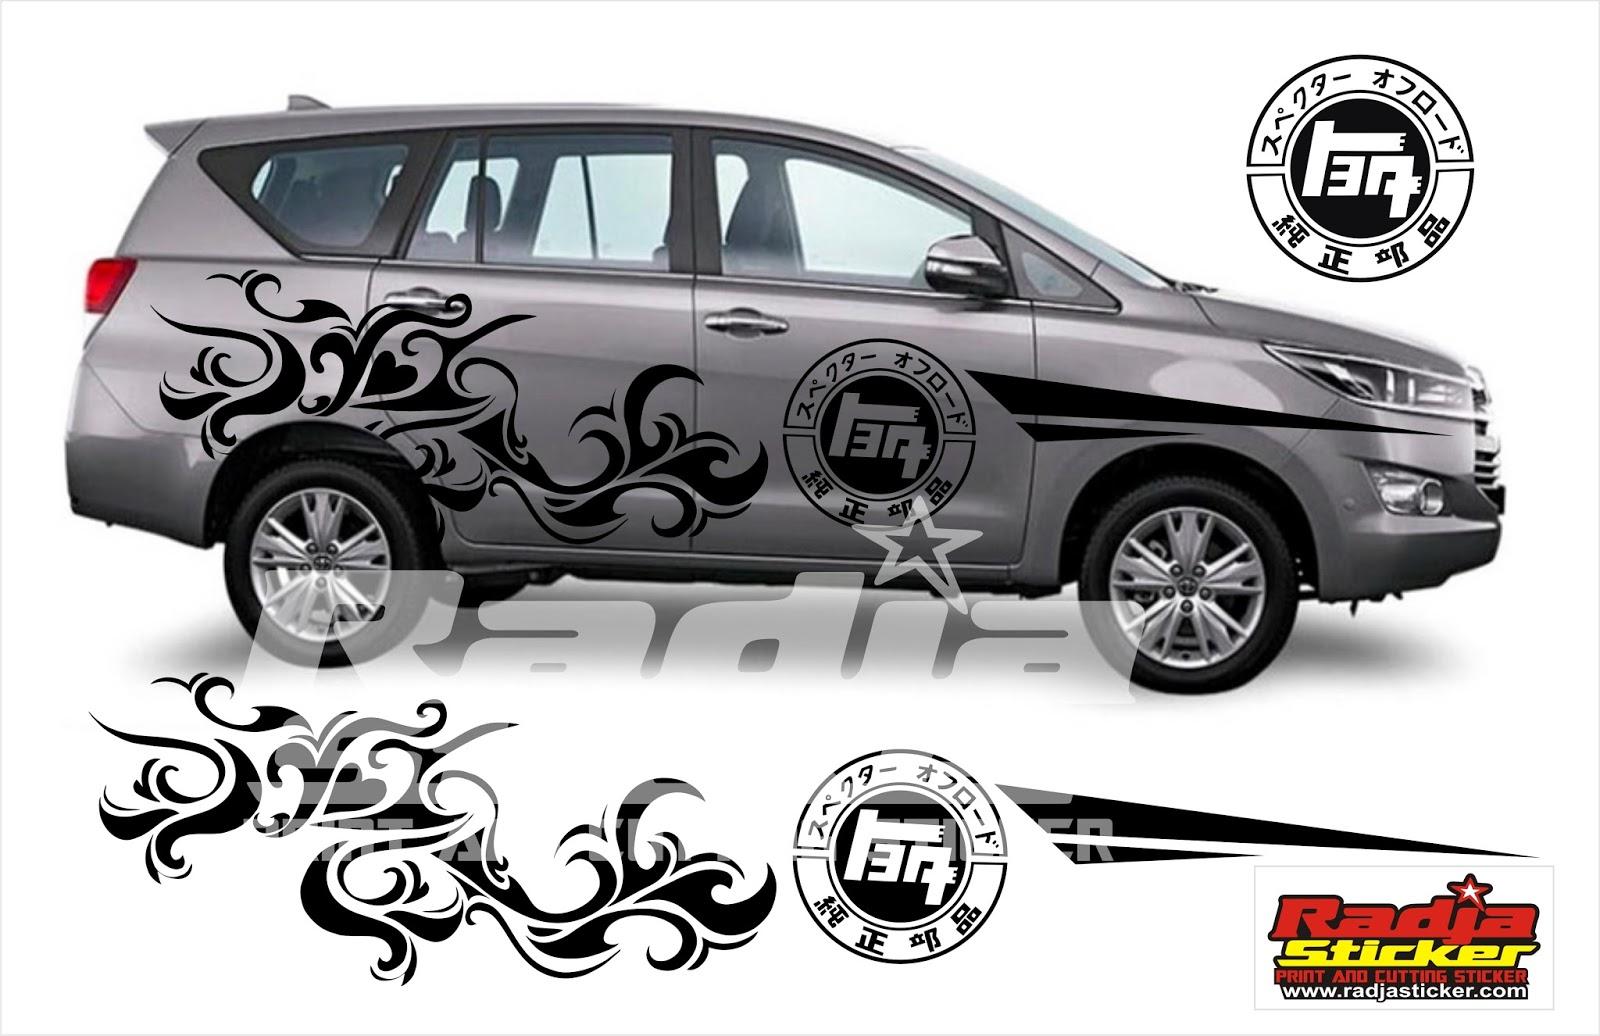 Koleksi Cutting Sticker Mobil Ertiga Terlengkap ...